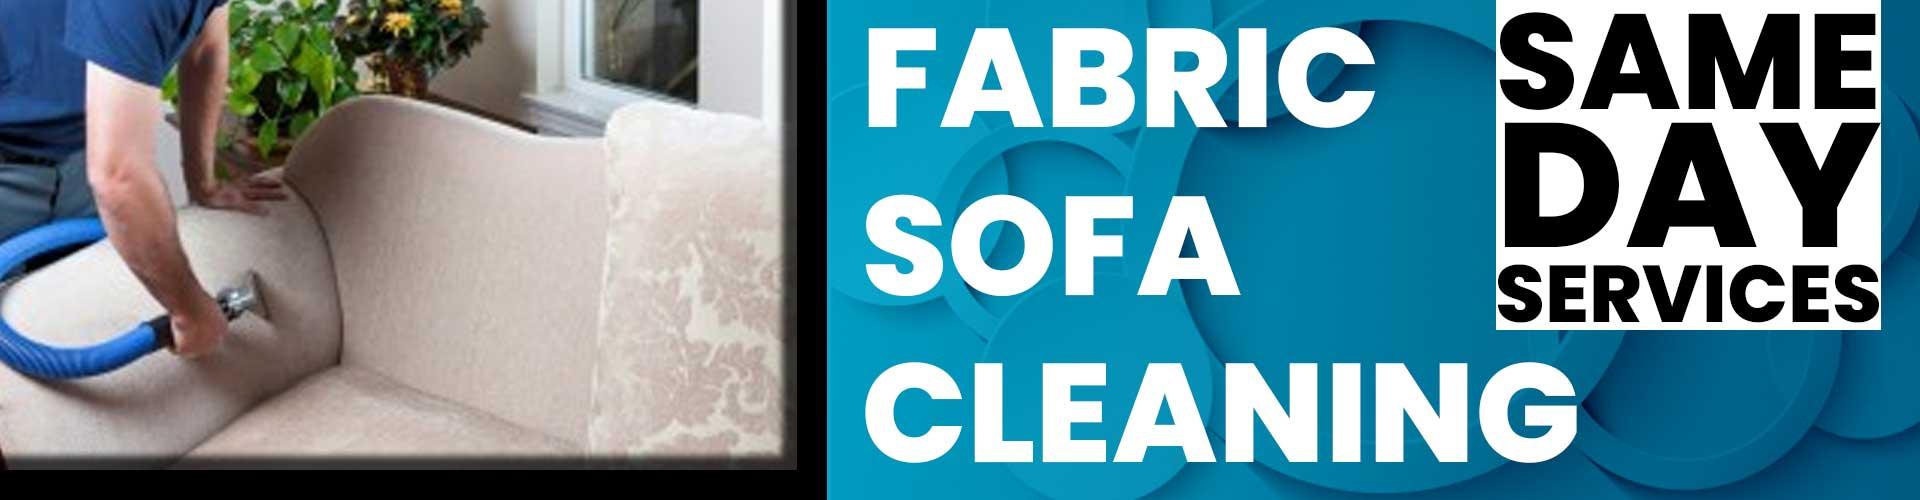 Sabric Sofa Cleaning